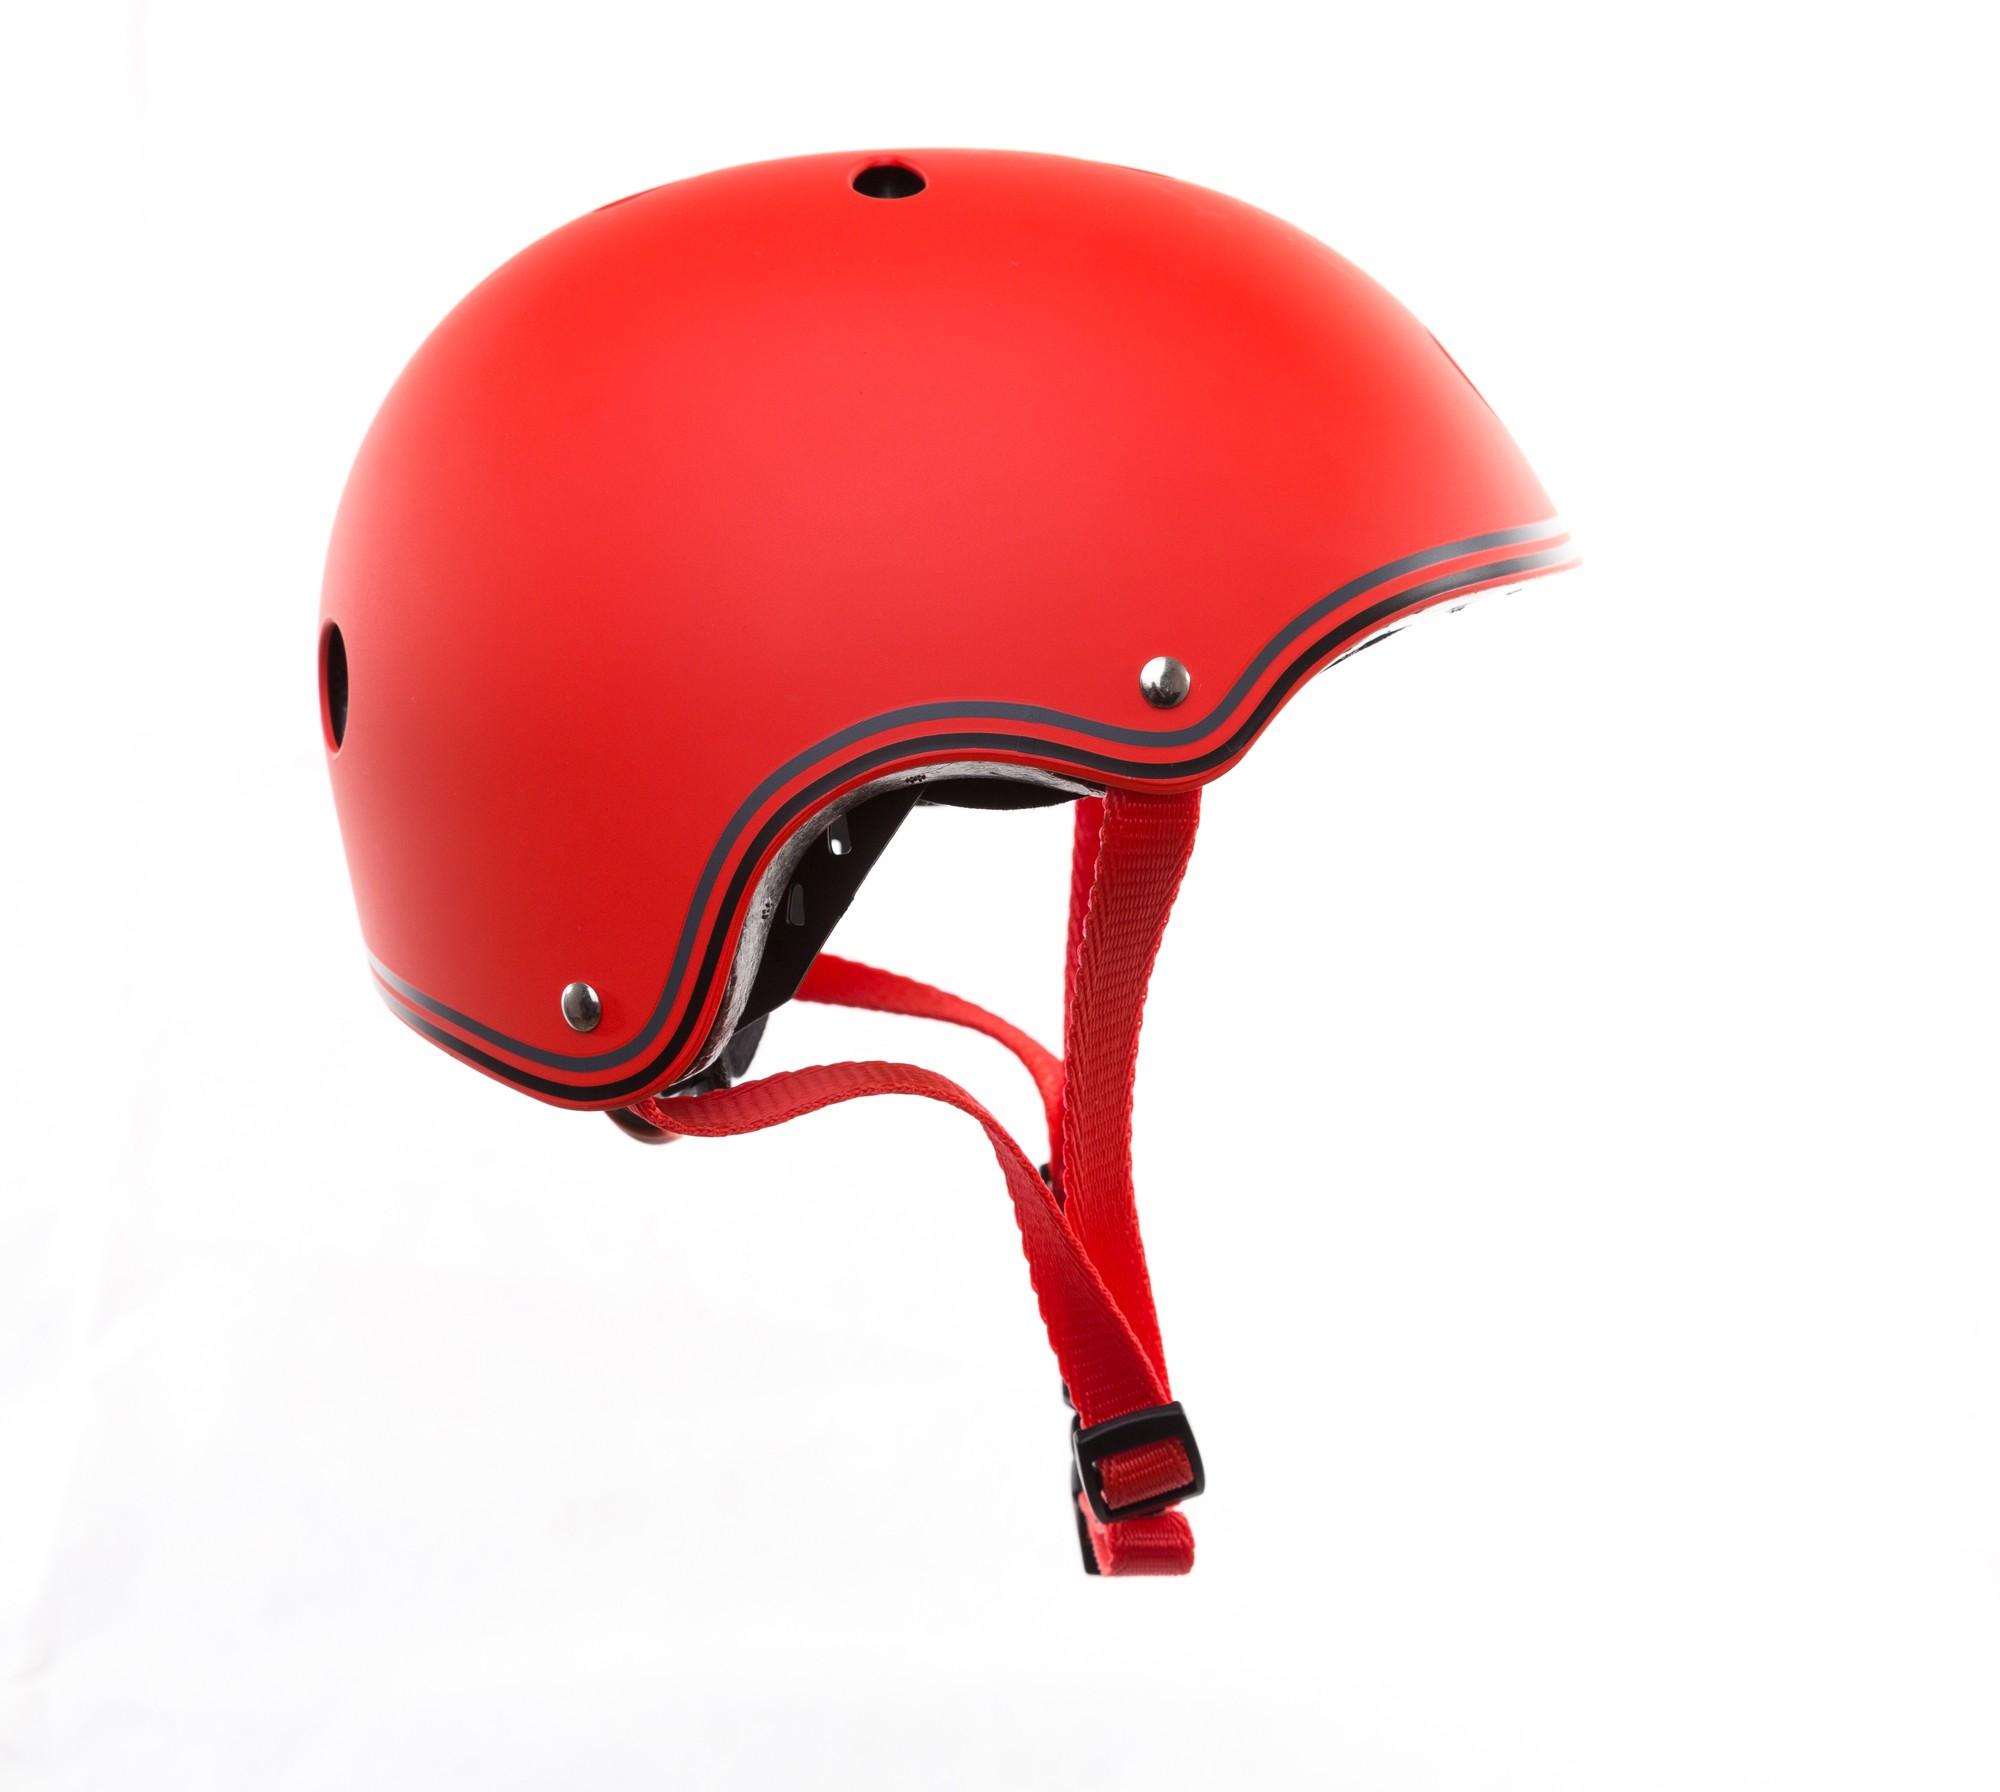 Skateboarder Helm / Skater Helm Globber Junior rot Größe 51-54cm Bild 1